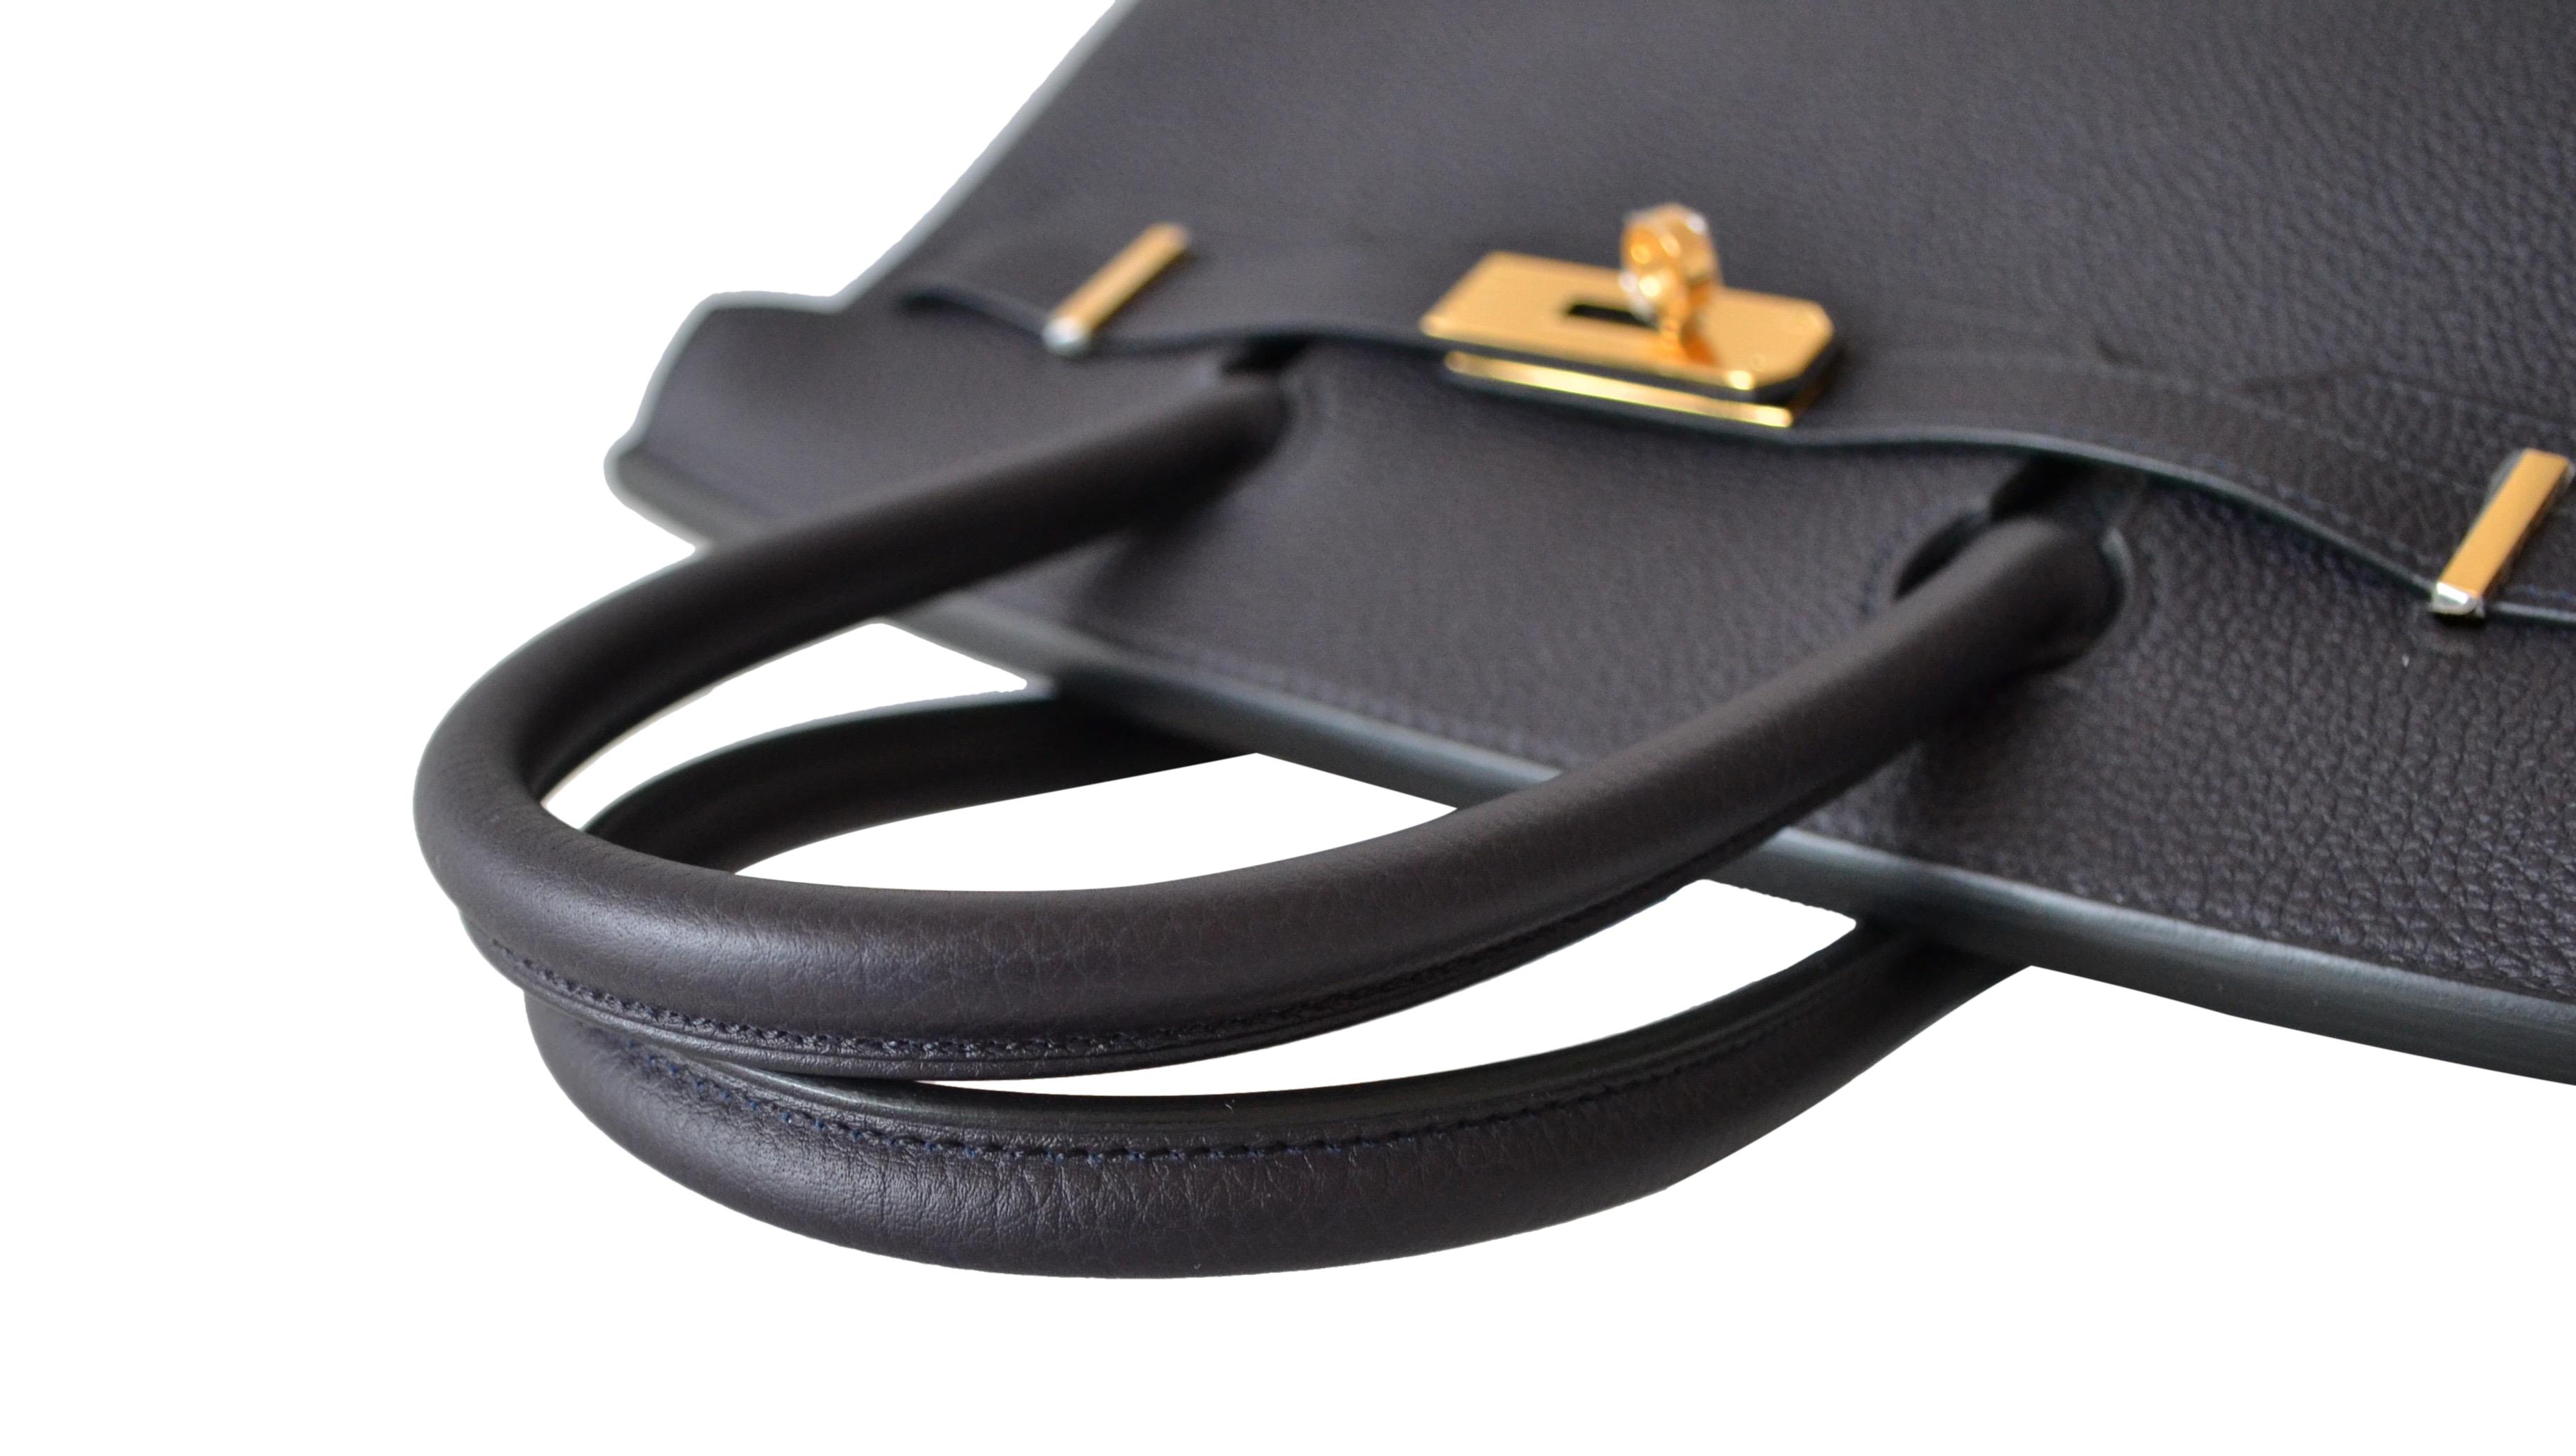 Sac Hermès Birkin 30 Togo Noir